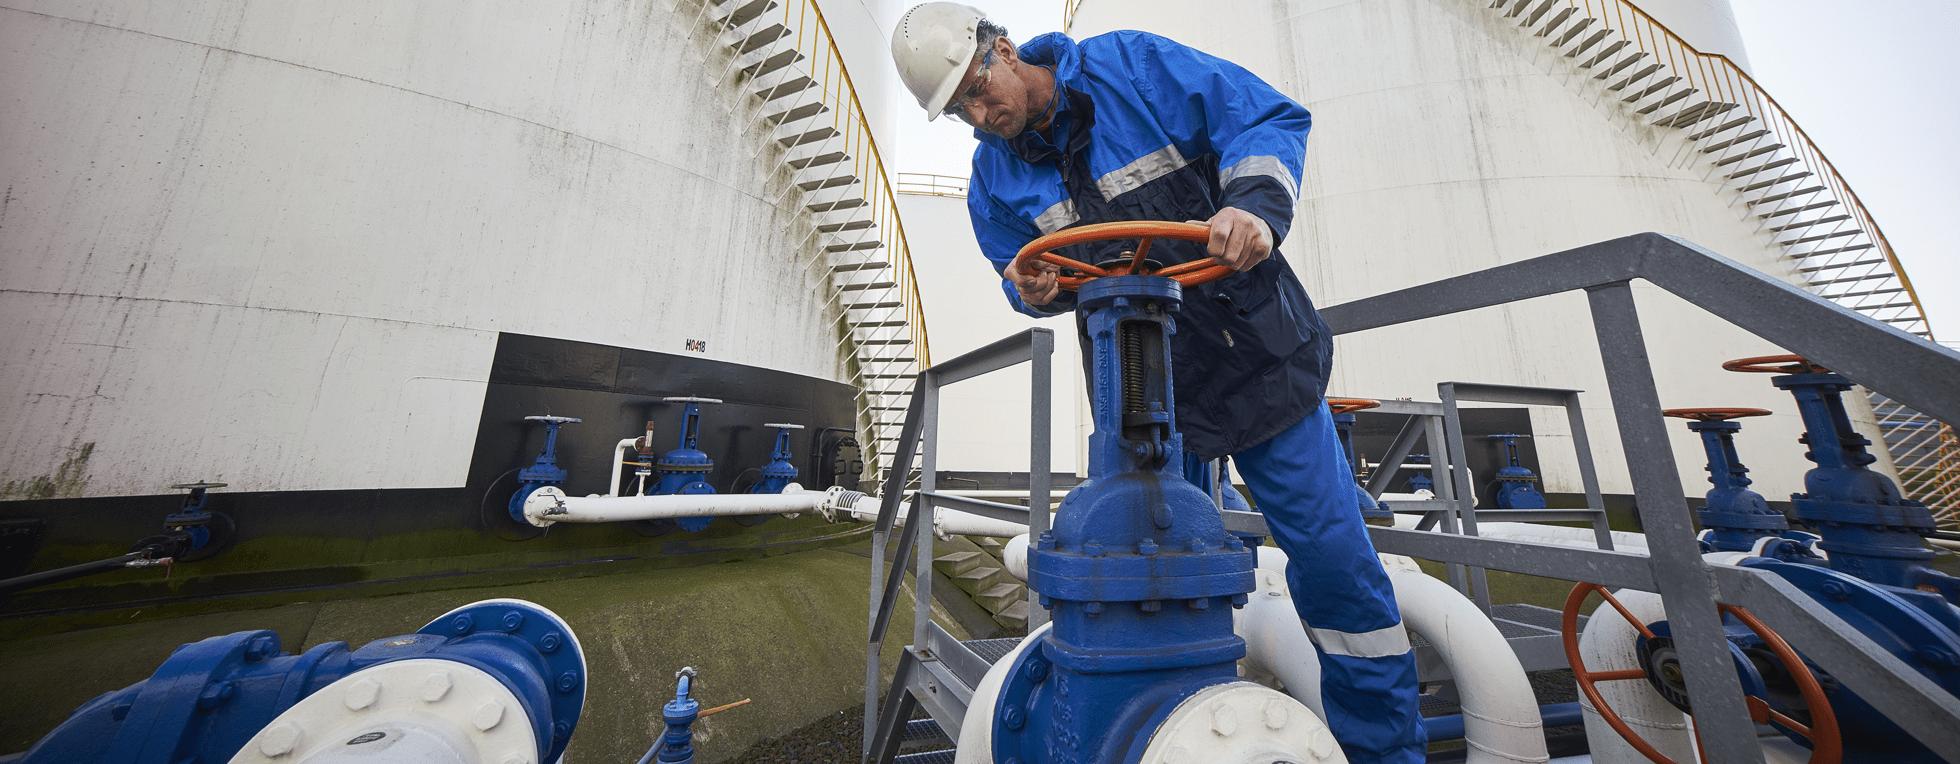 Centurion Pipeline's Sustainability Report